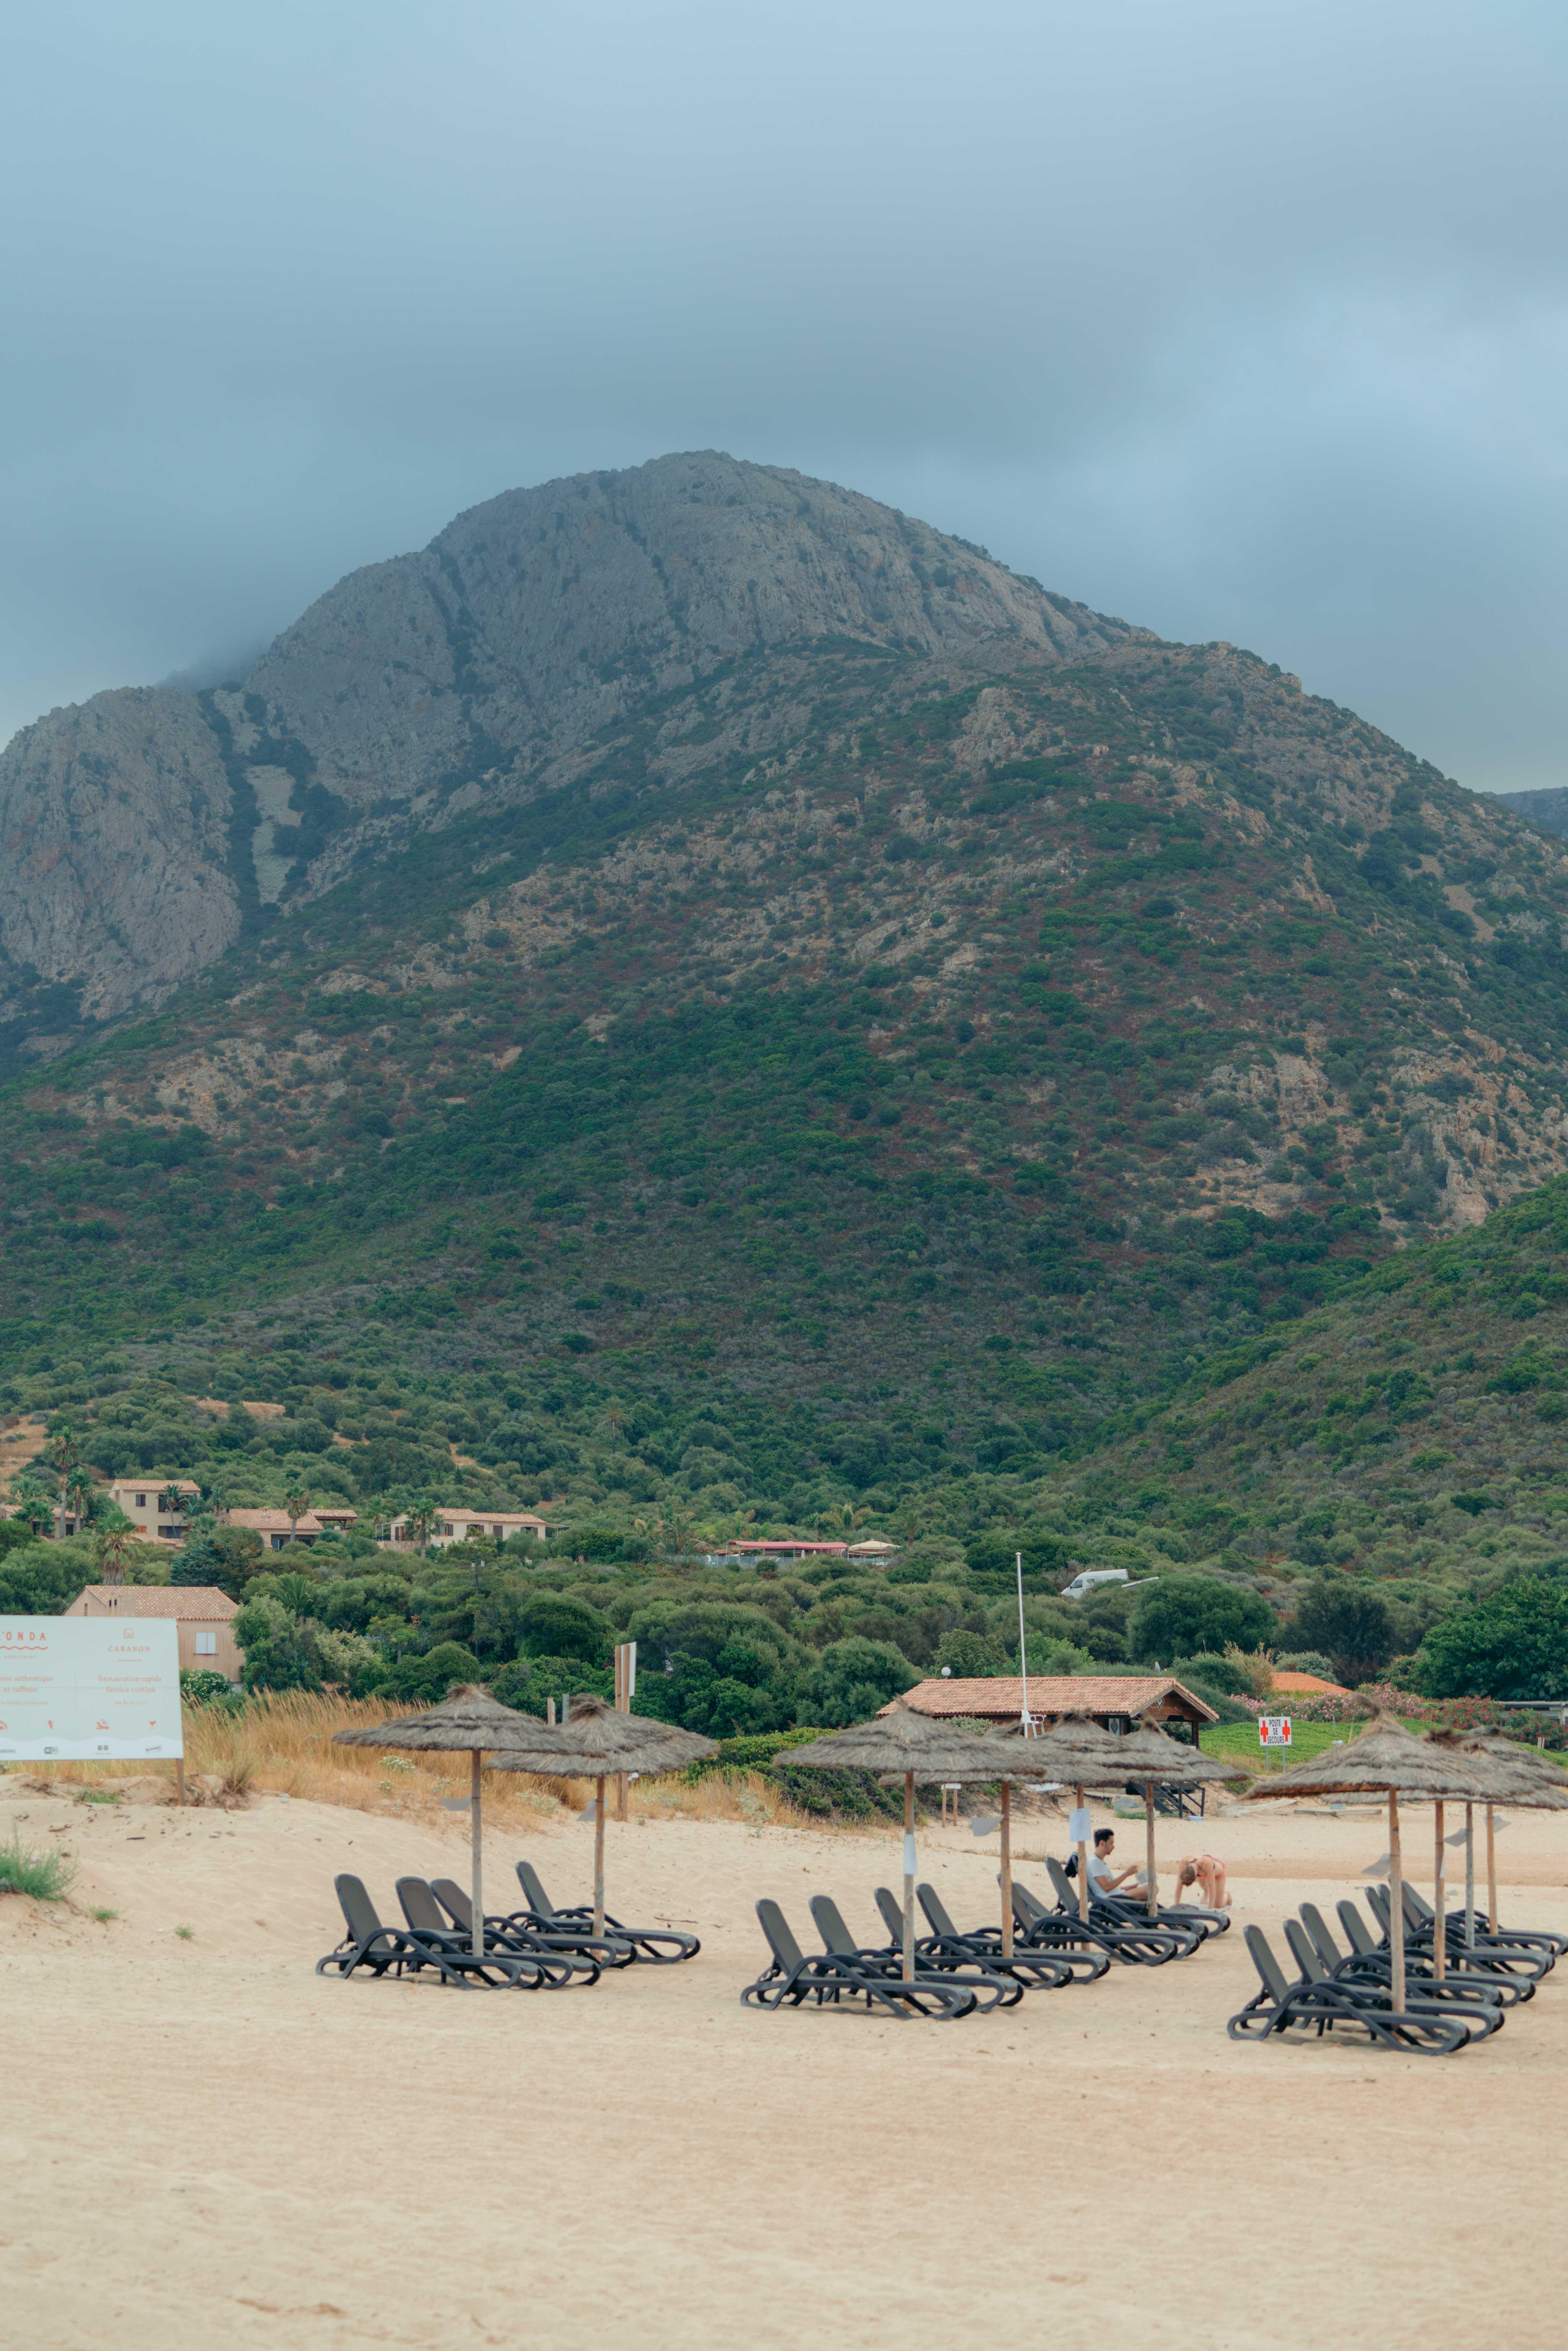 Plage d'arone piana korsyka najlepsze plaże na korsyce